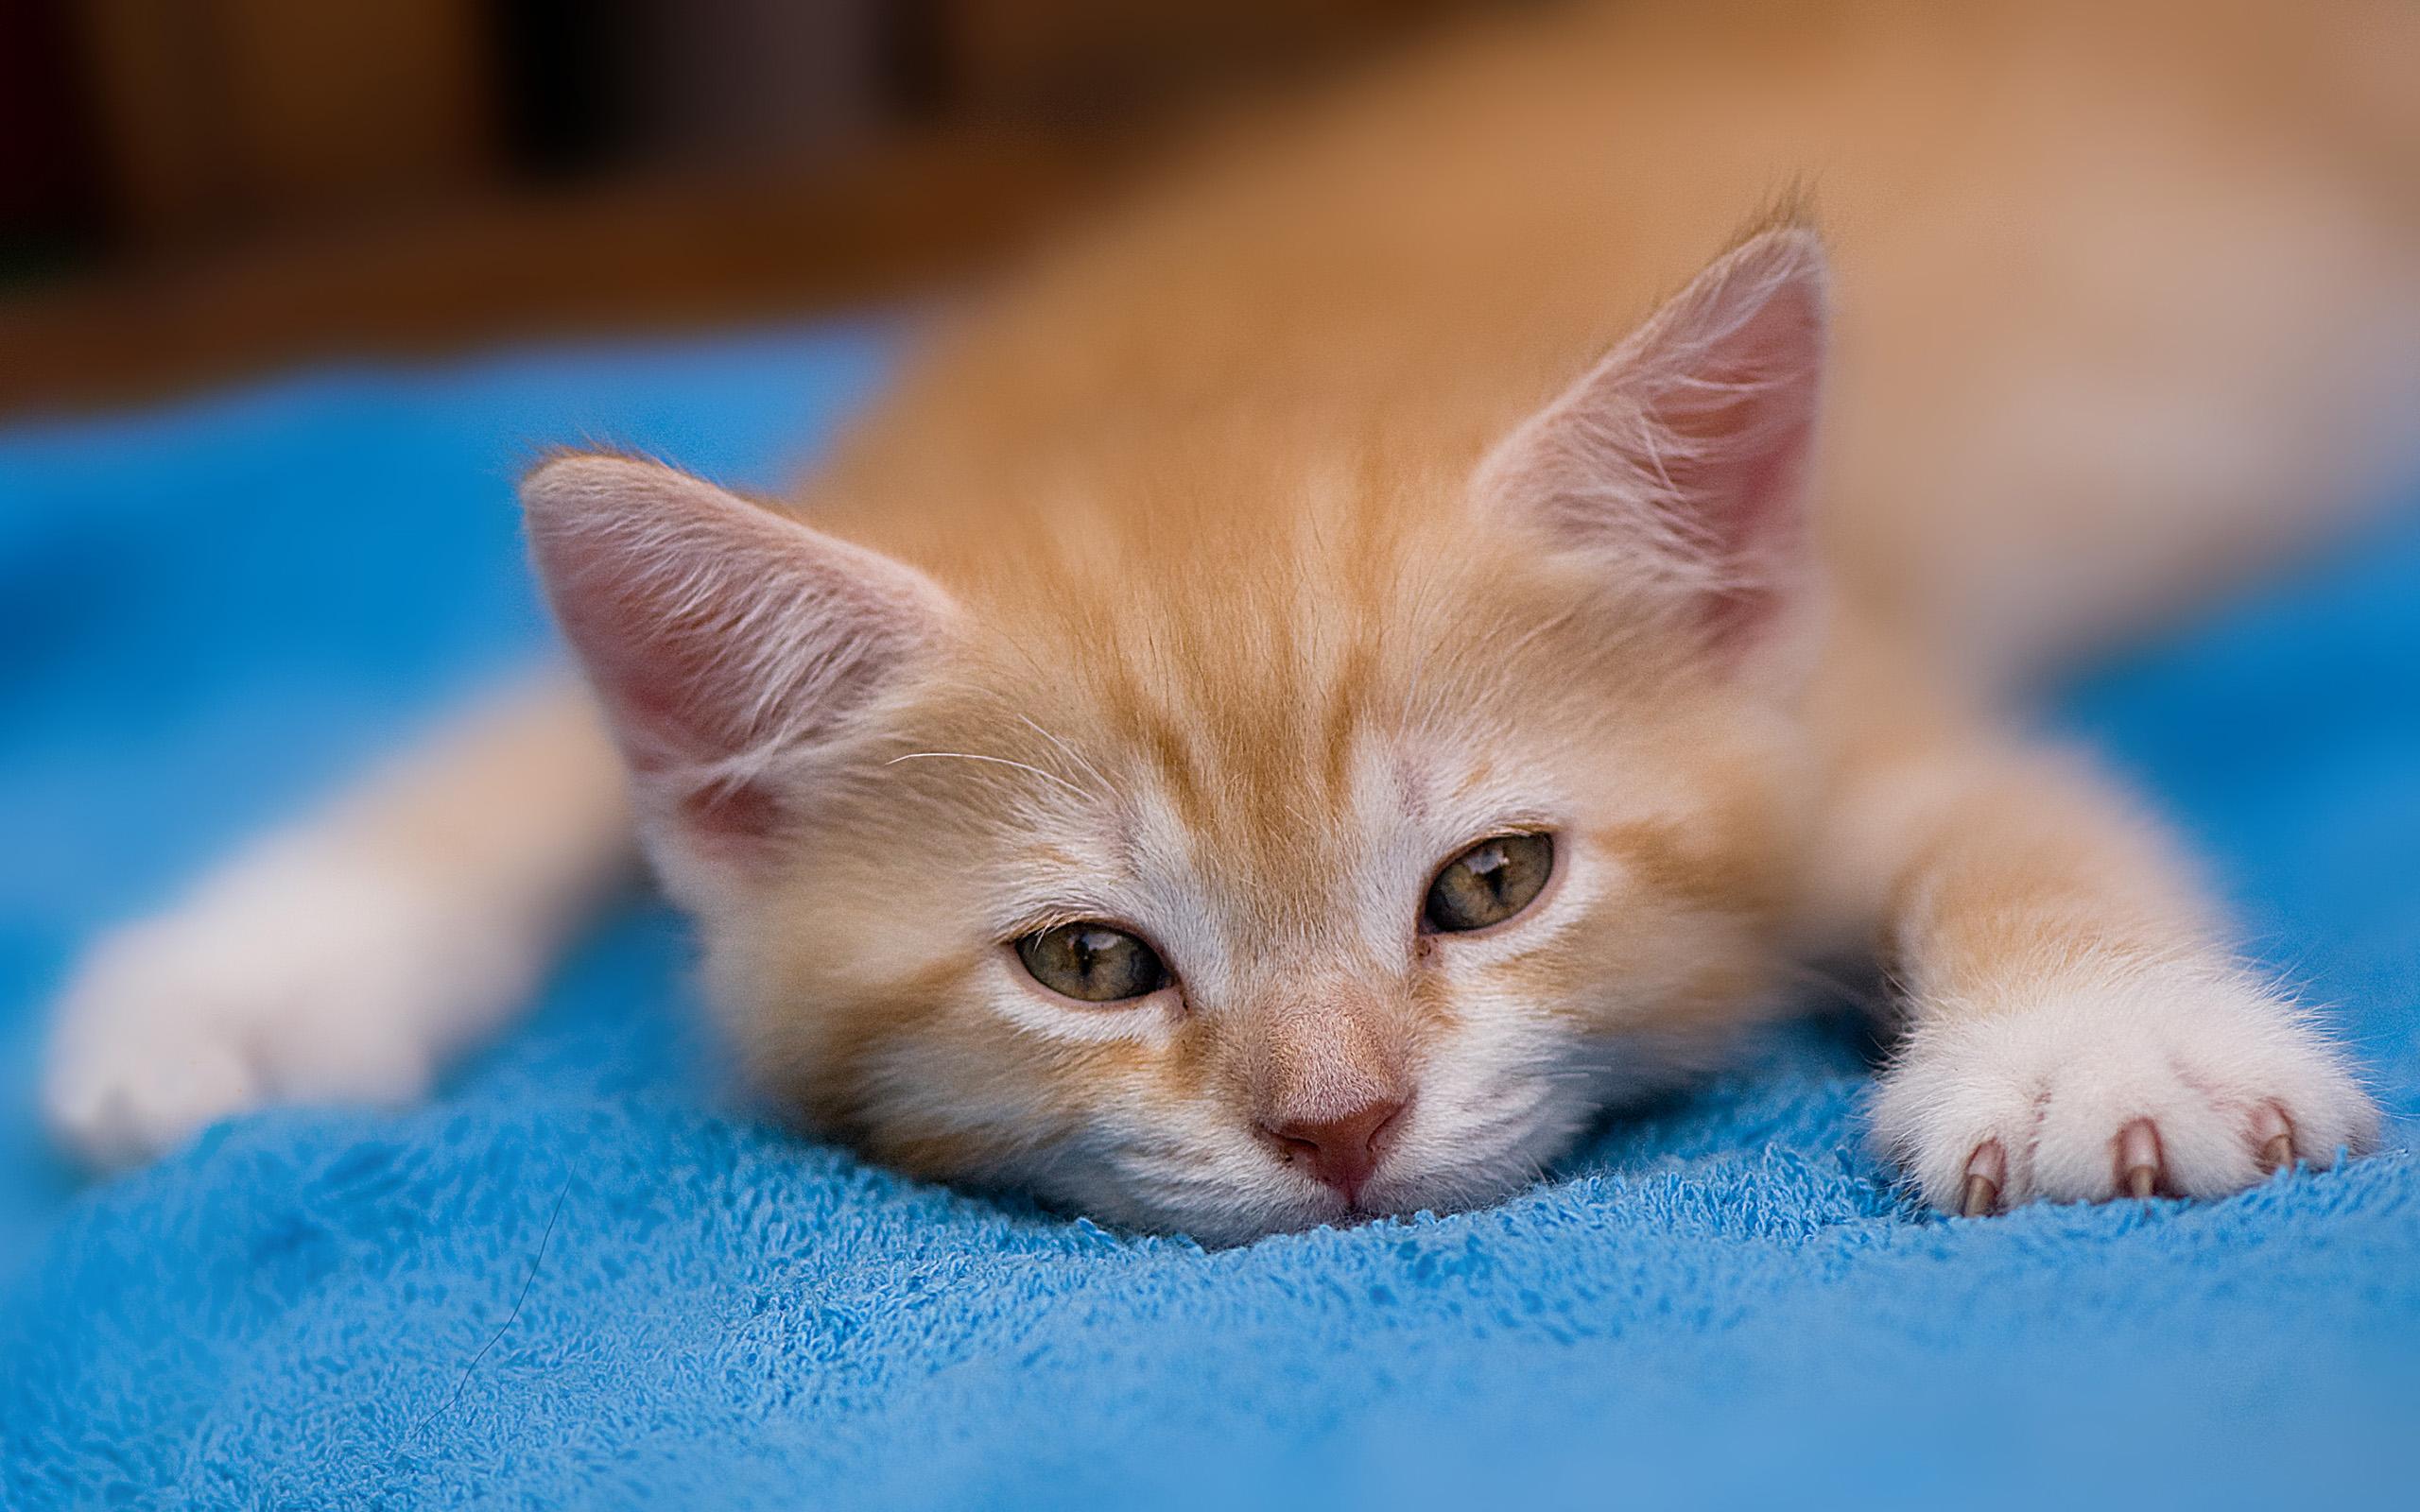 Free kitten wallpaper for desktop wallpapersafari - Free wallpaper of kittens ...